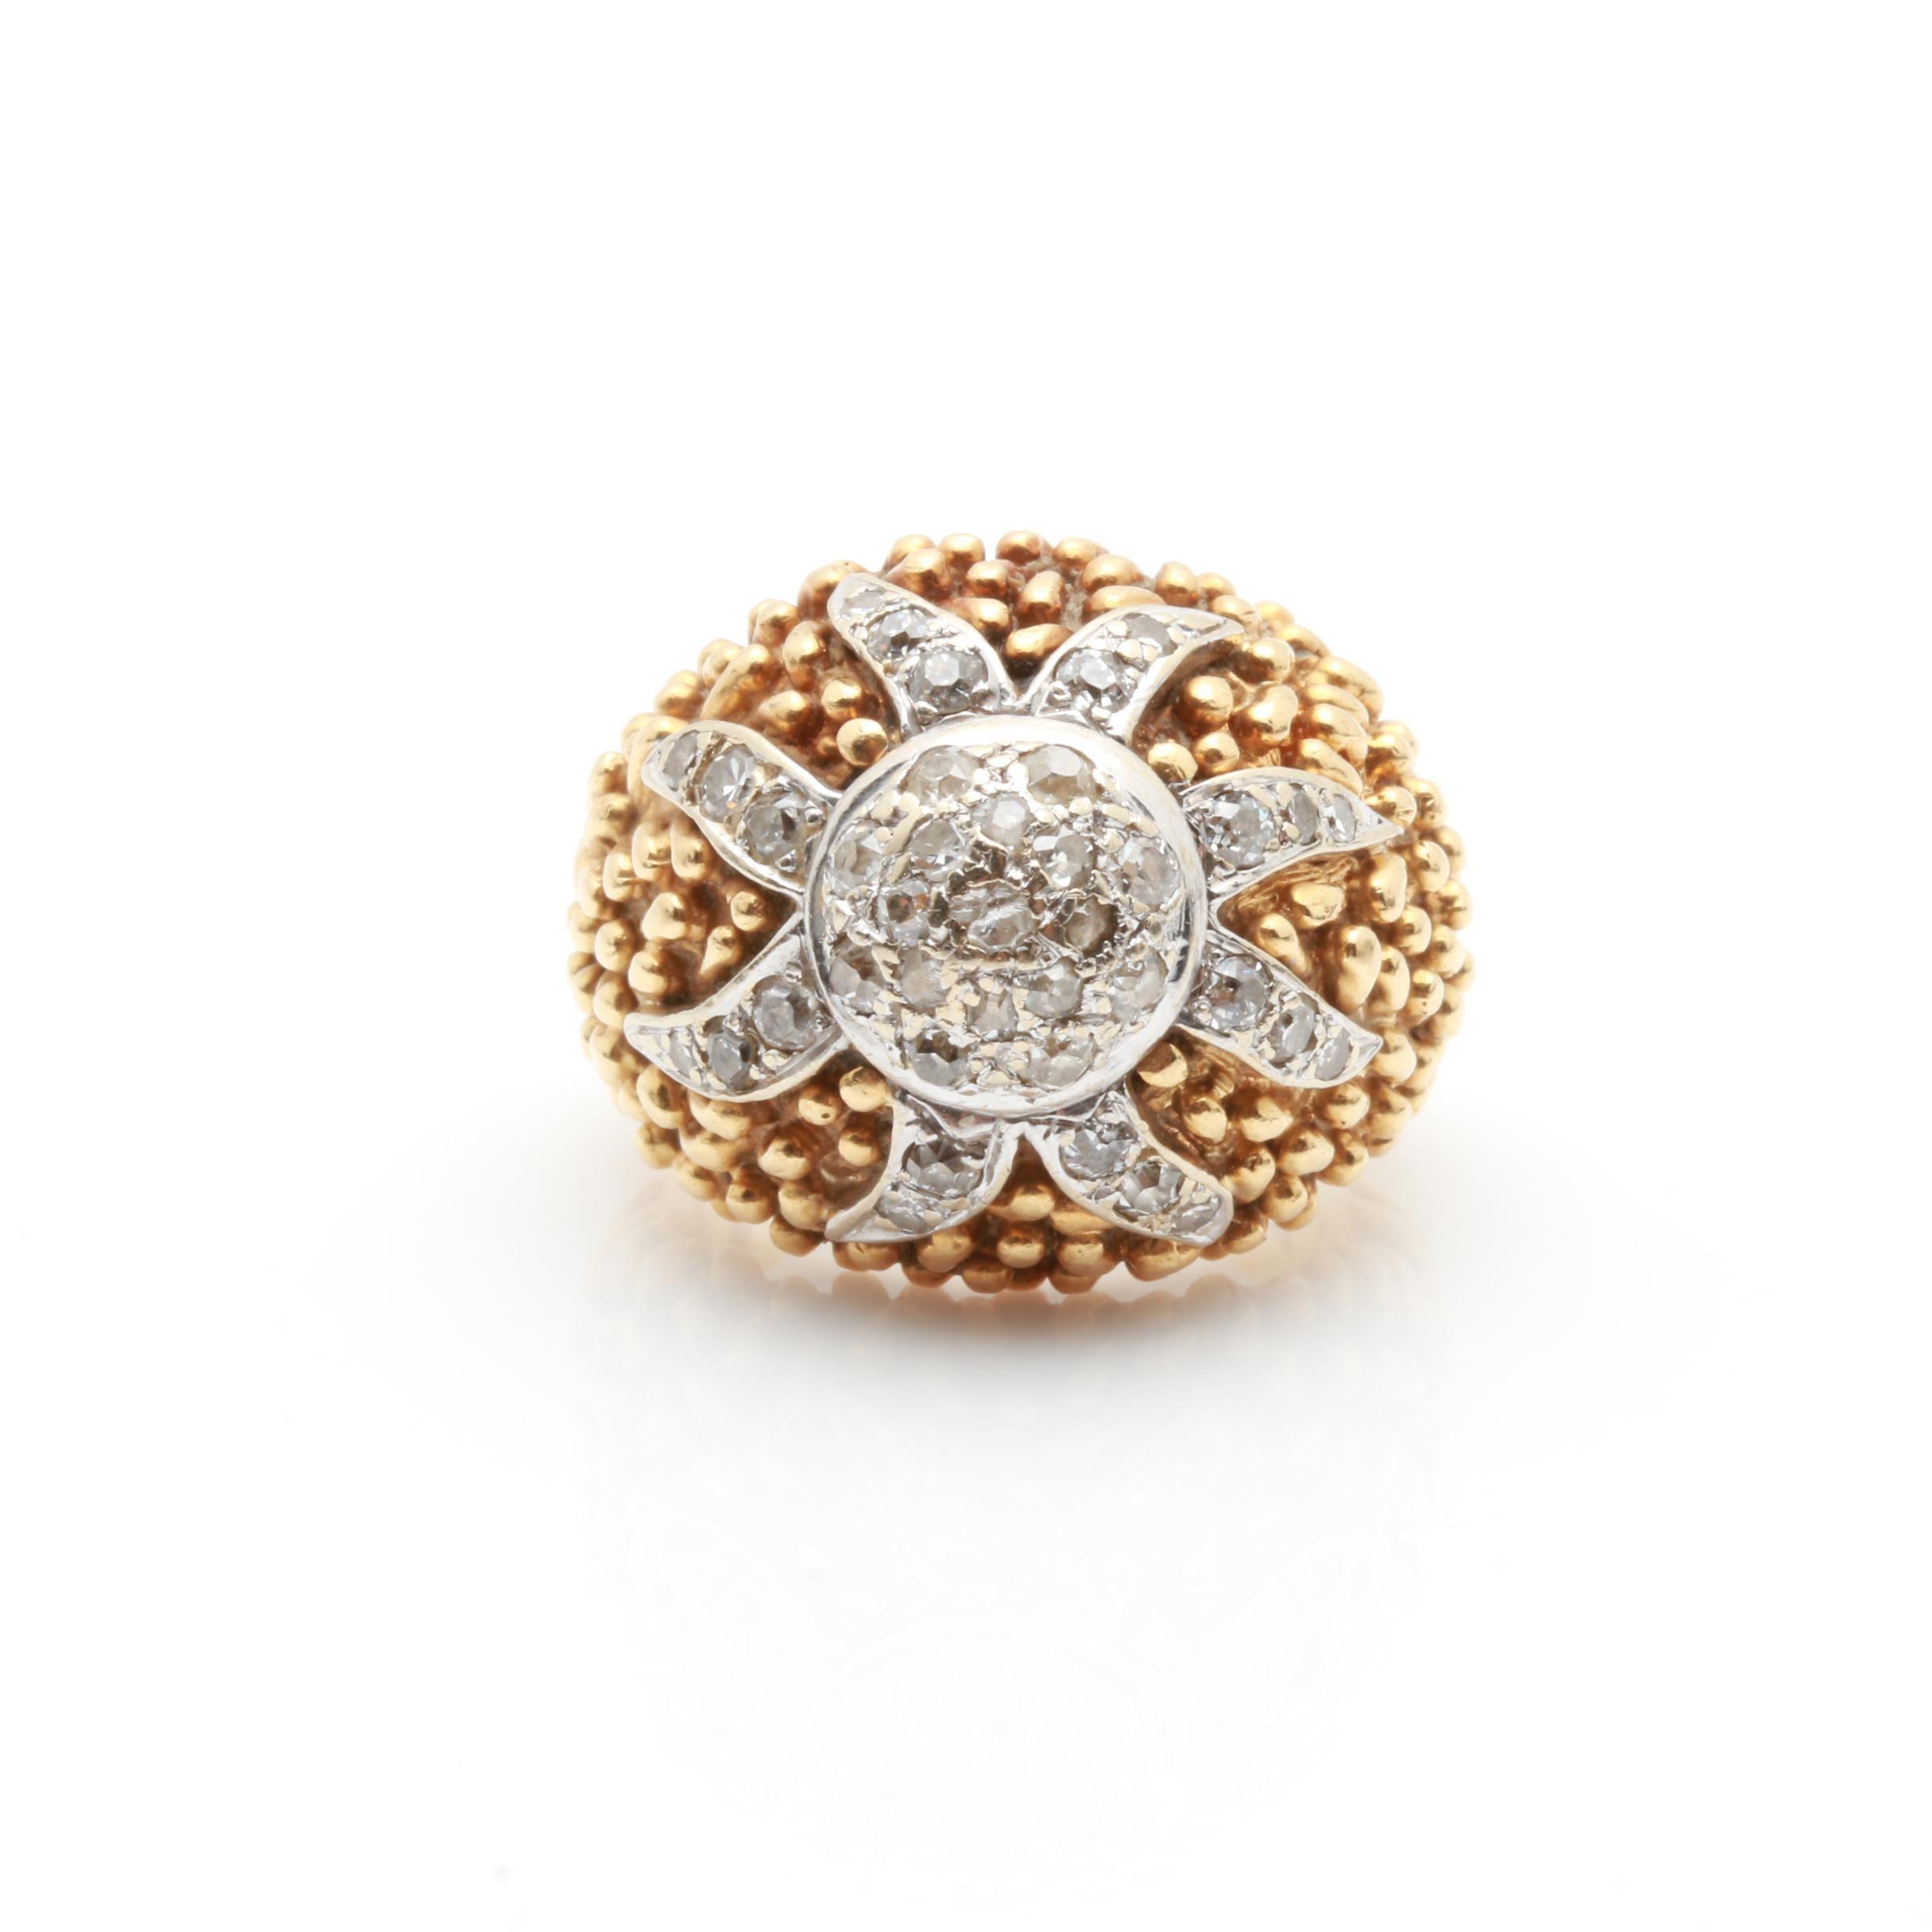 Vintage 18K Yellow And White Gold Diamond Bombé Ring